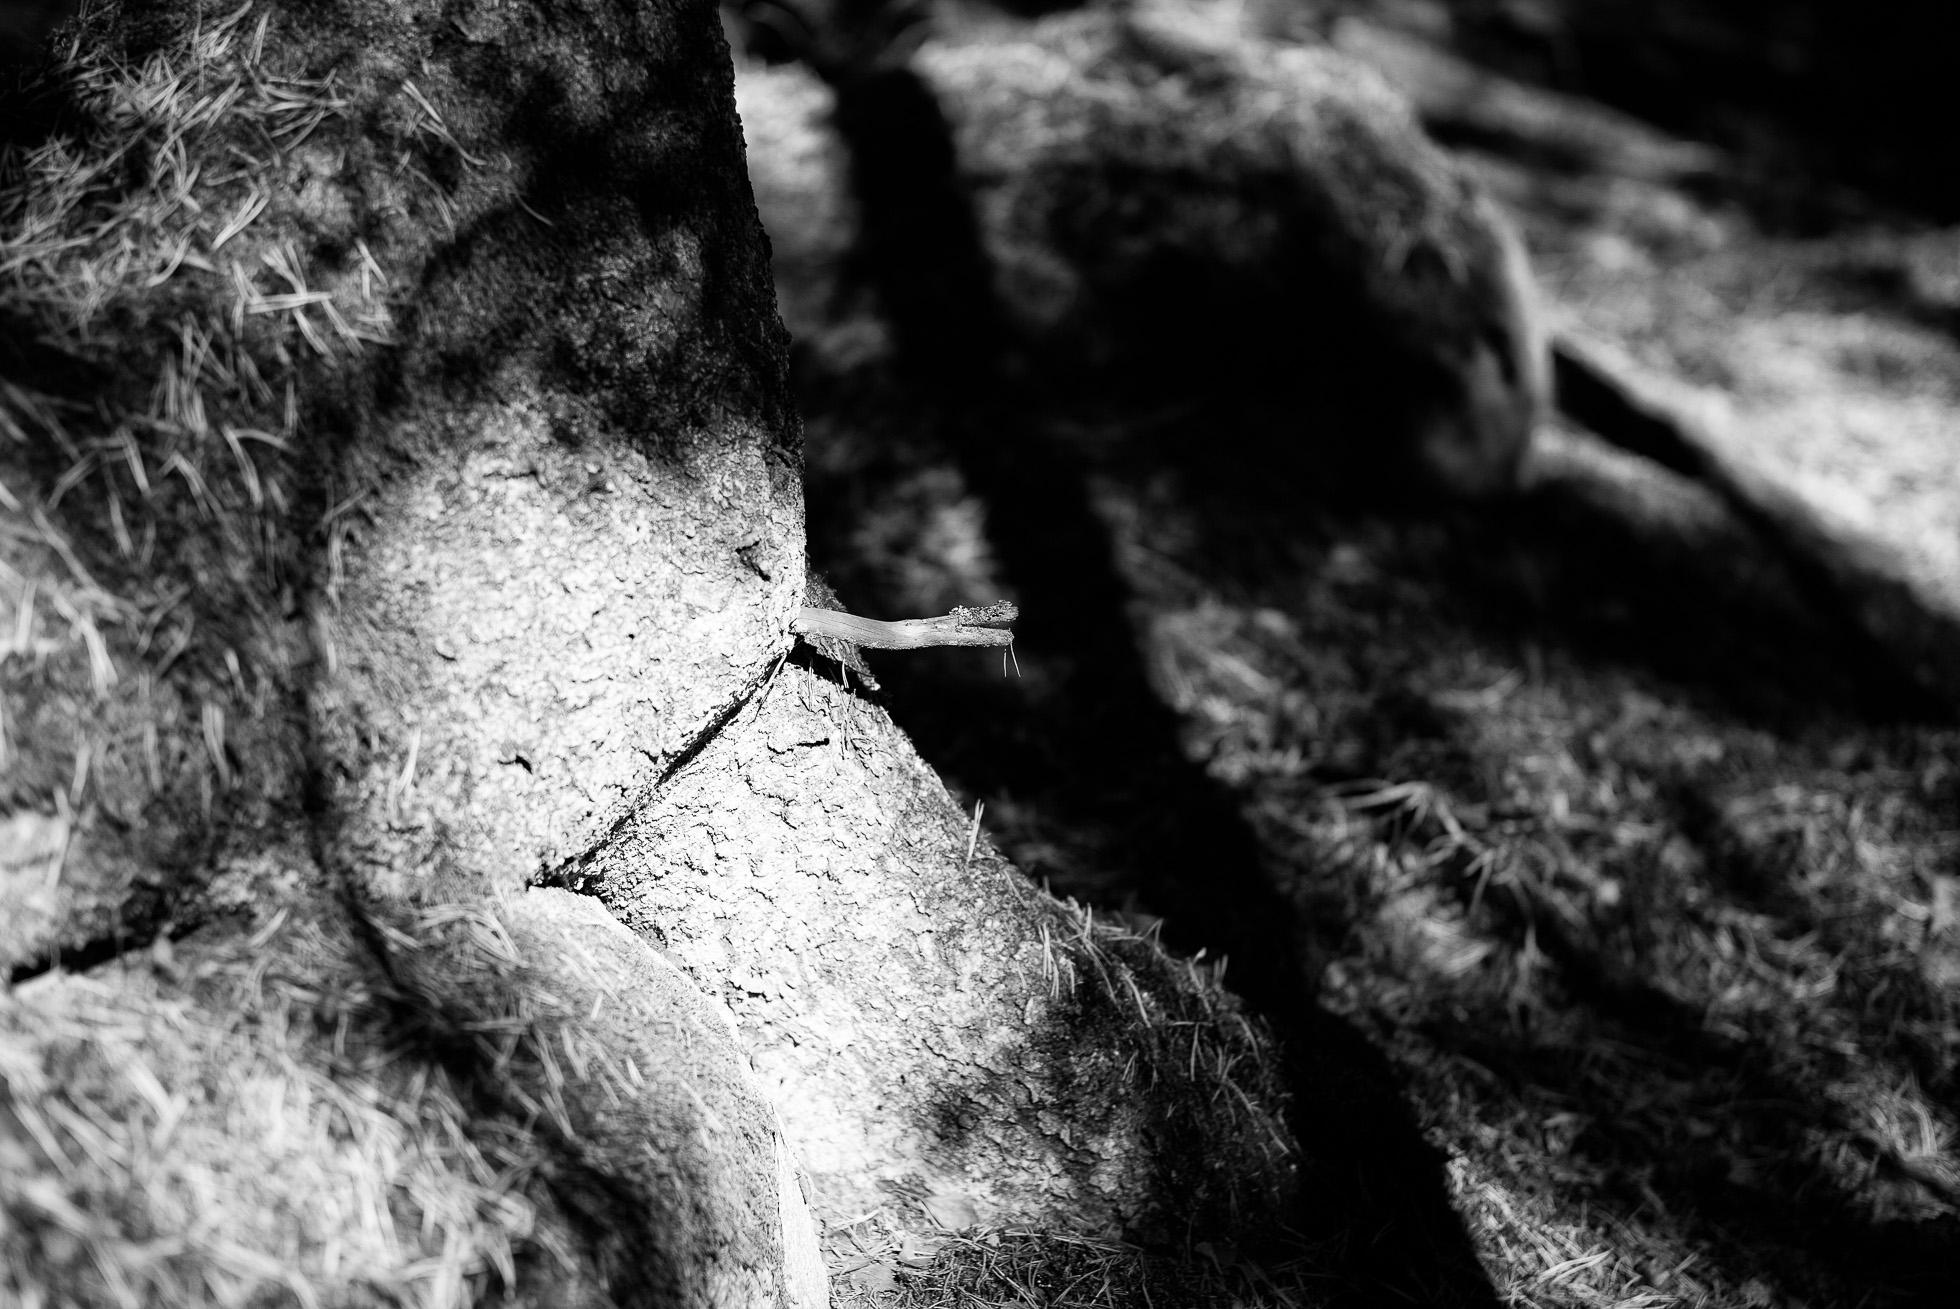 2016-10-01-skogspromenad-mortsjon__2016-10-01__0041-redigera